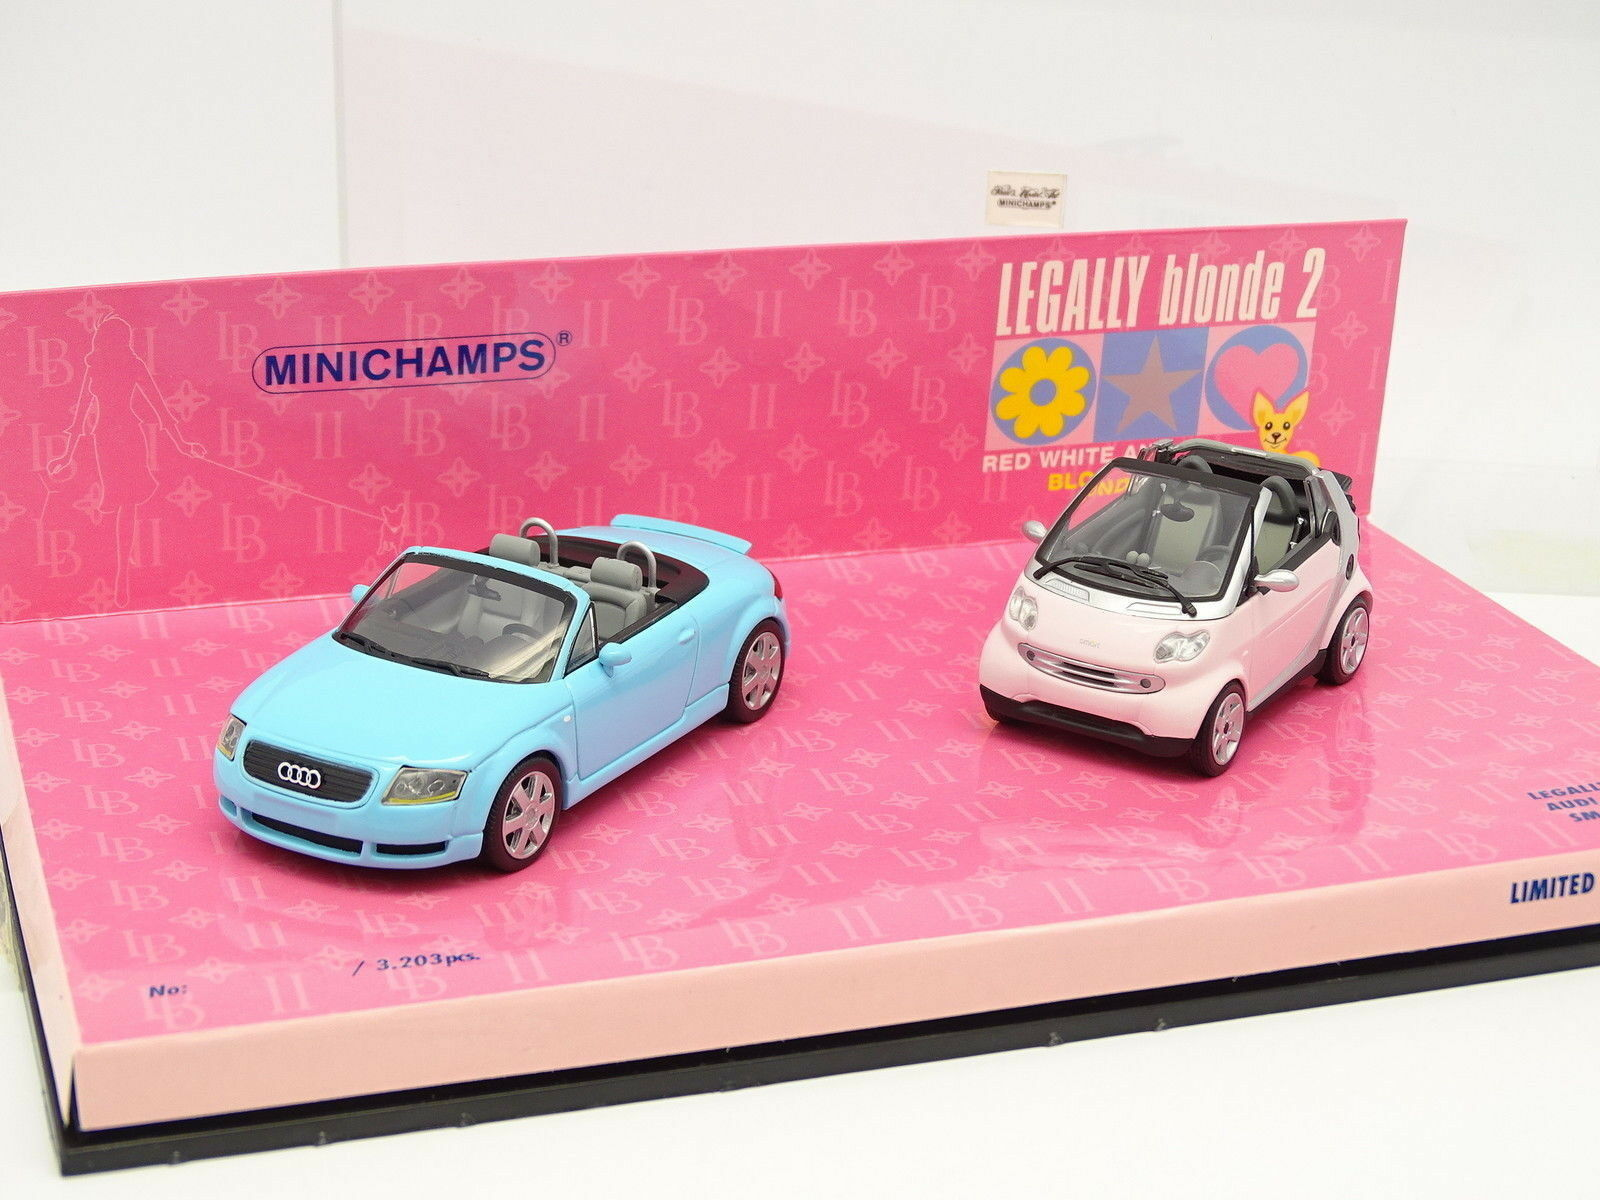 Minichamps 1 43 - Boxset Audi TT + Smart Cabriolet Legally Blonde 2